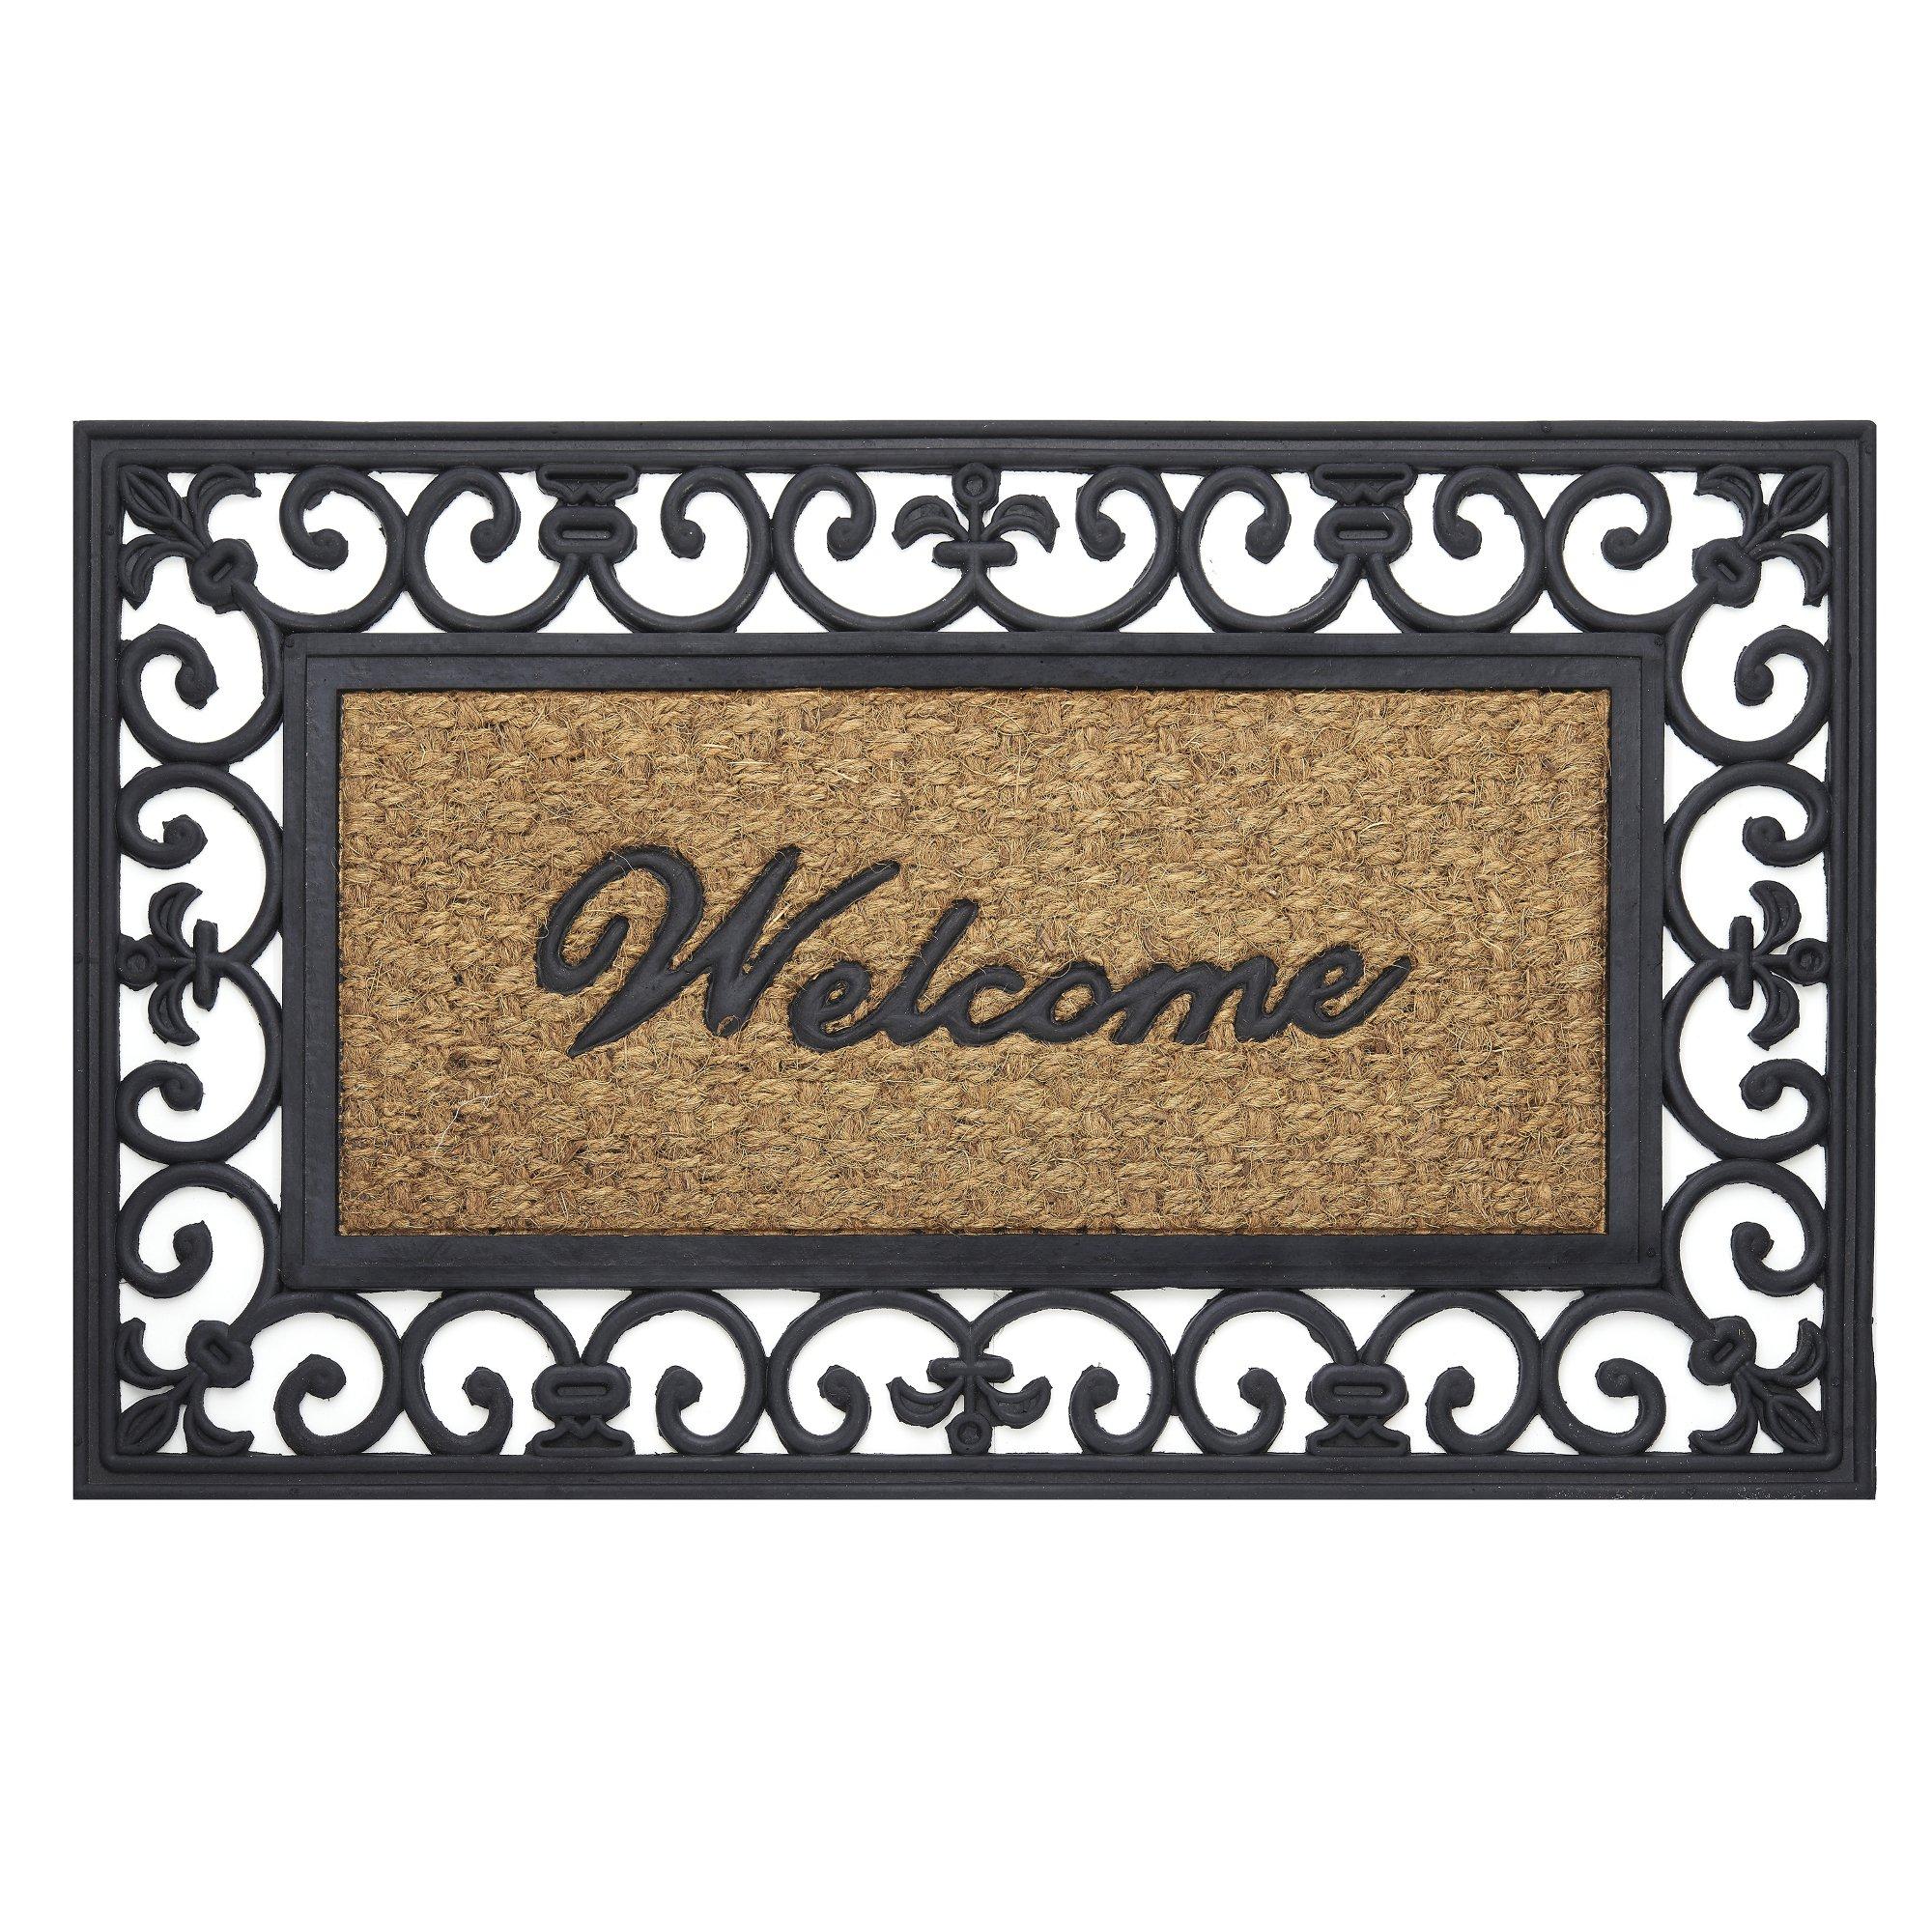 Achim Home Furnishings WRM1830FL6 Fleur De Lis Wrought Iron Rubber Door Mat, 18 by 30''